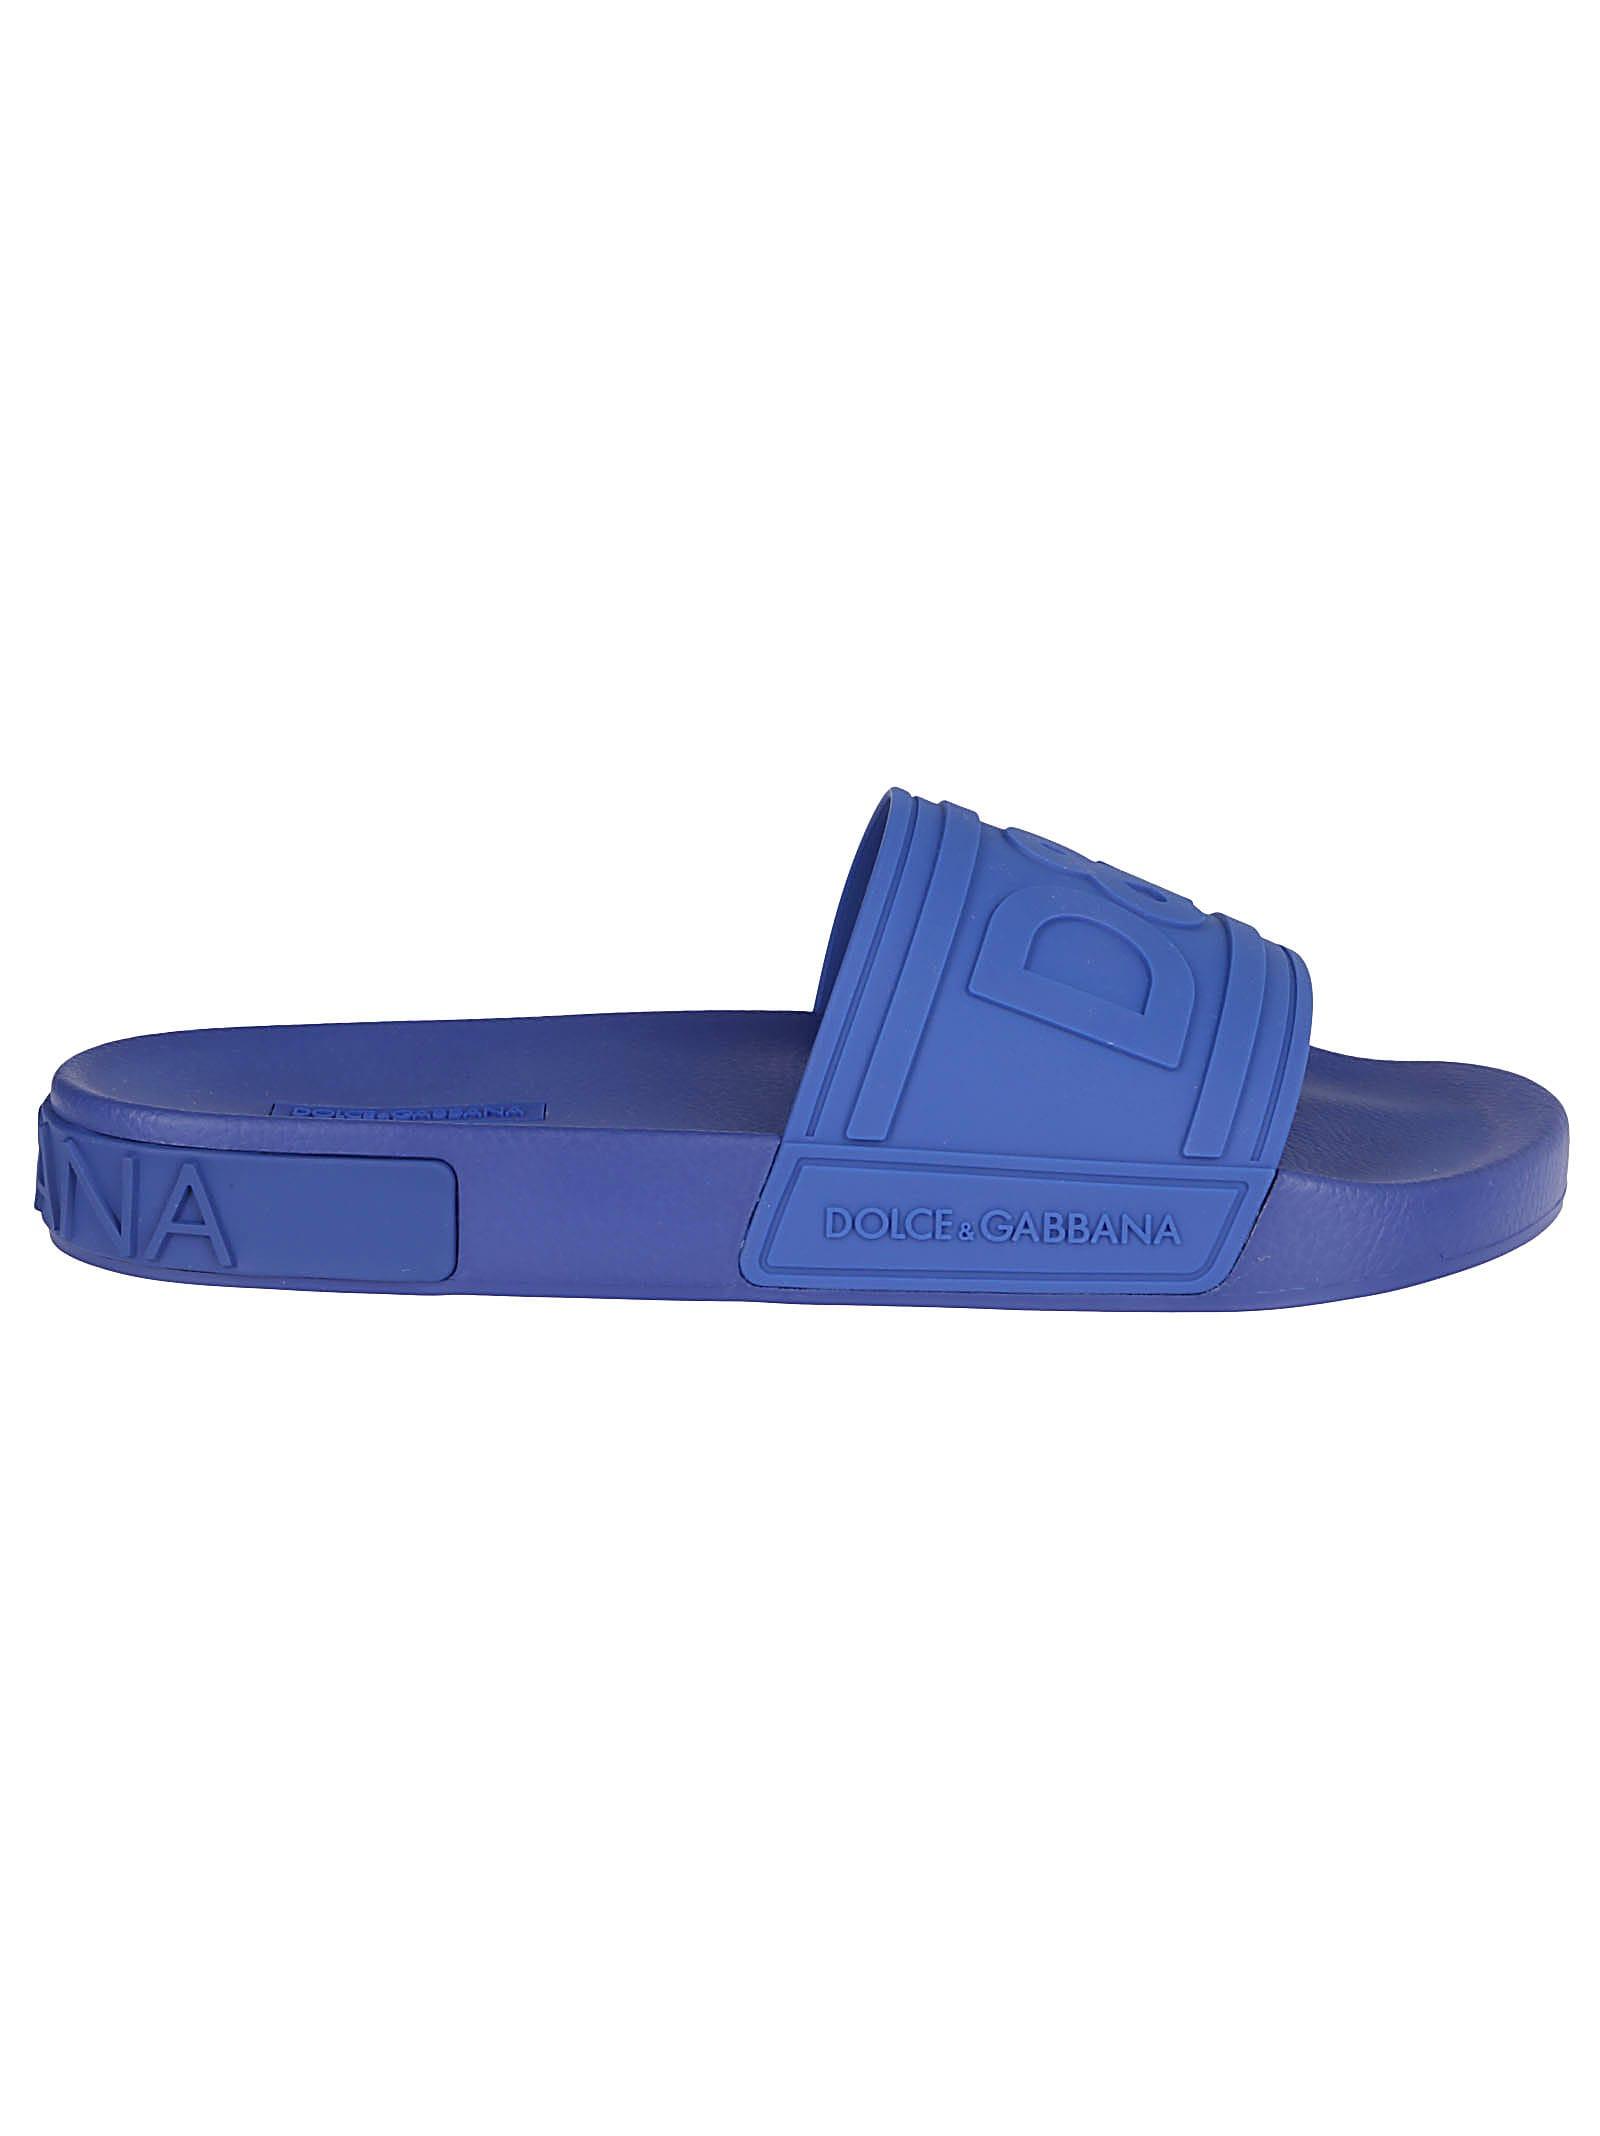 Electic Blue Sliders